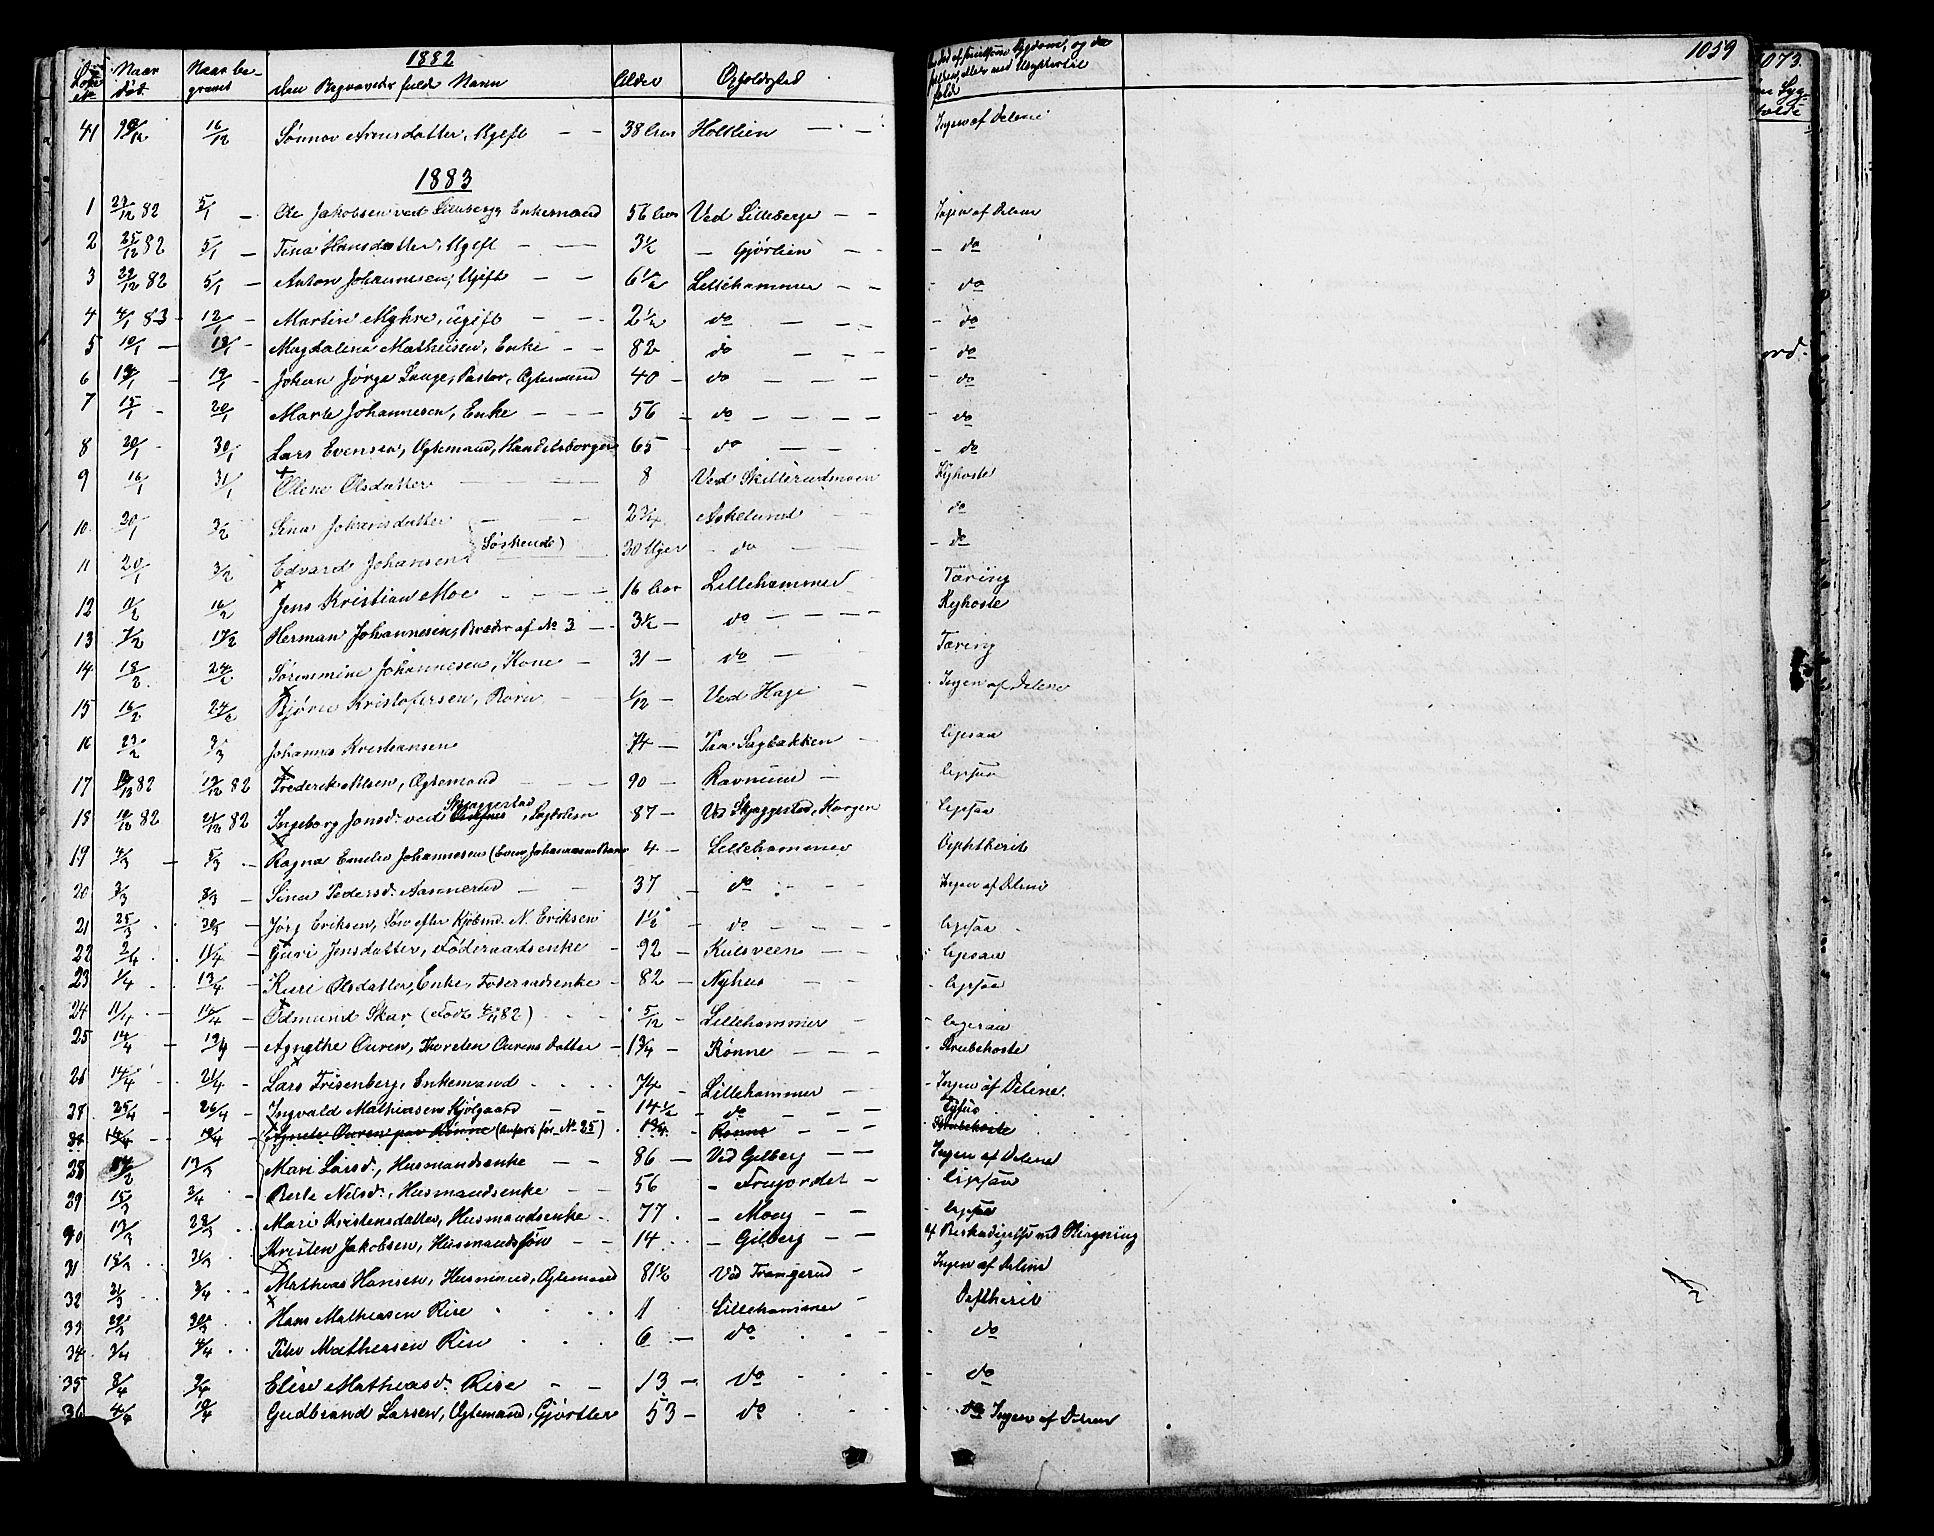 SAH, Fåberg prestekontor, Klokkerbok nr. 7, 1856-1891, s. 1058-1059